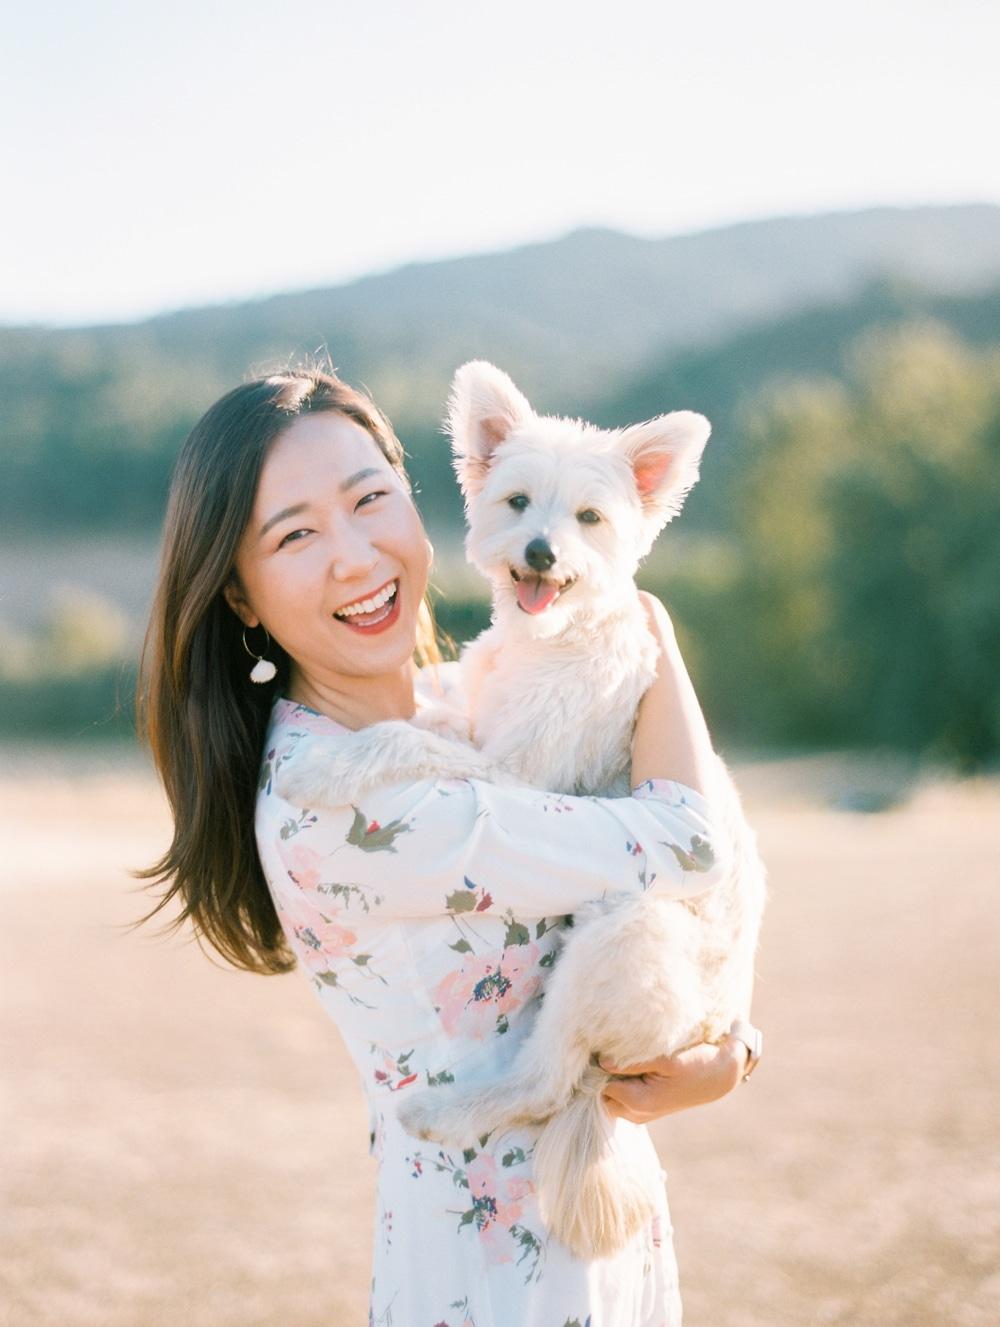 Kristin-La-Voie-Photography-california-wedding-photographer-dog-session-rancho-san-antonio-los-altos-2